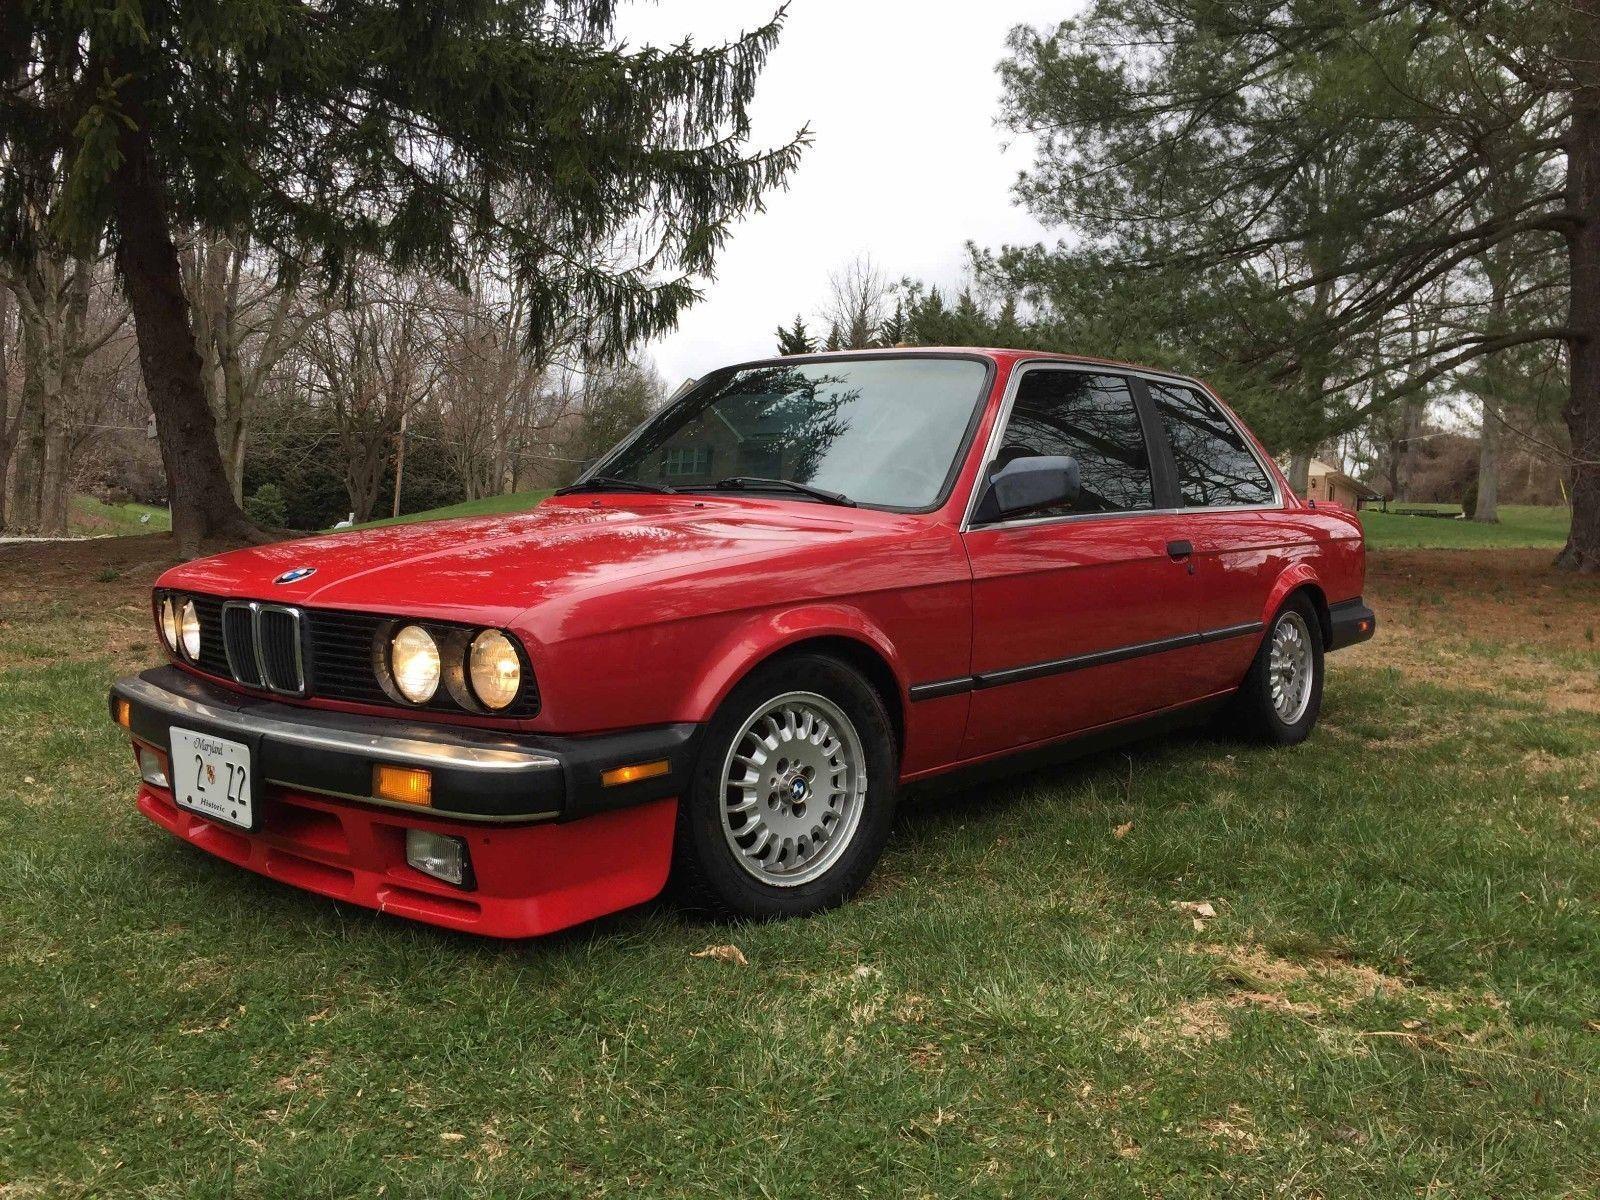 BMW E30 cu motor de Mustang GT - BMW E30 cu motor de Mustang GT